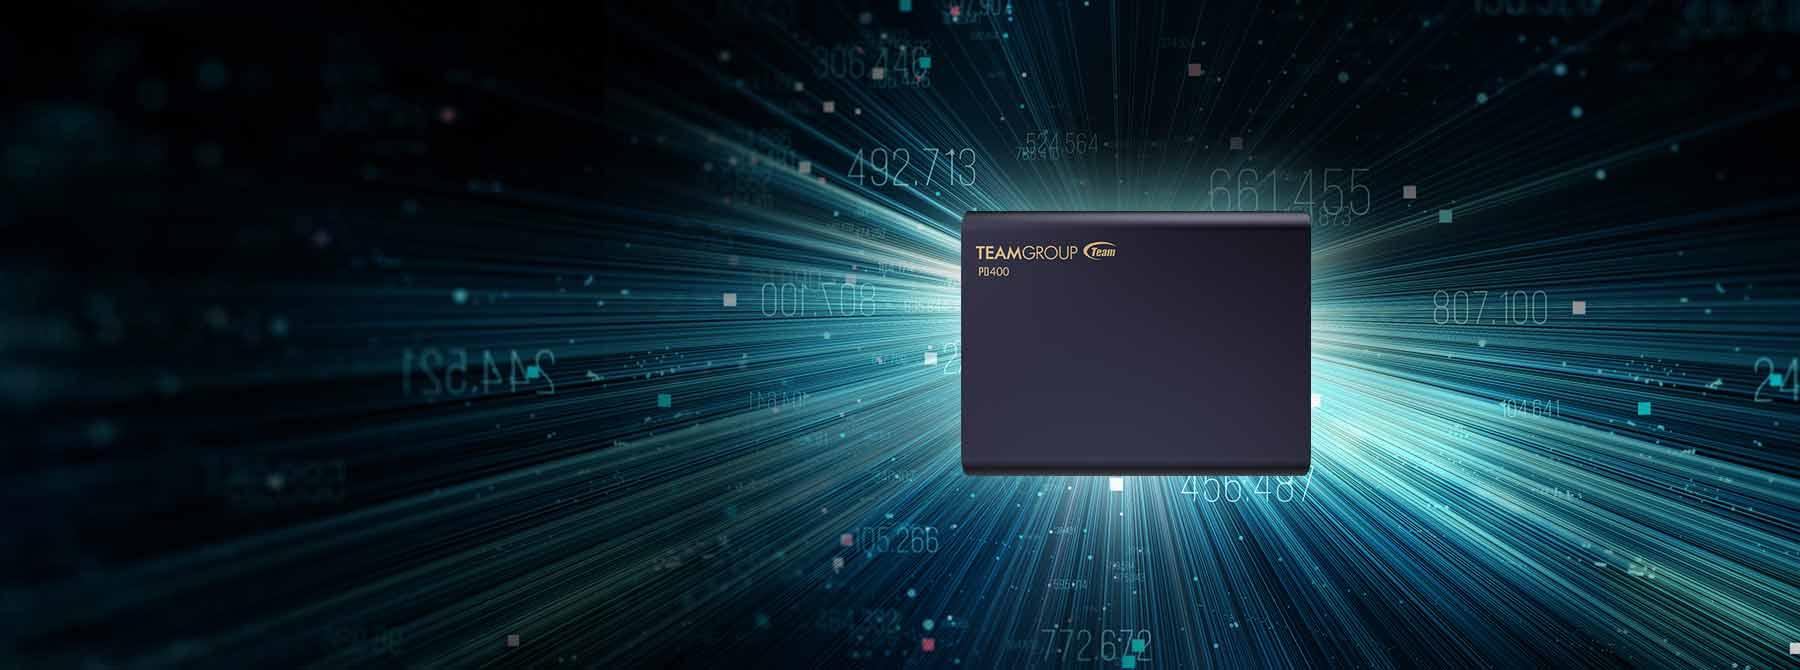 حافظه SSD TEAMGROUP PD400 ظرفیت 960 گیگابایت